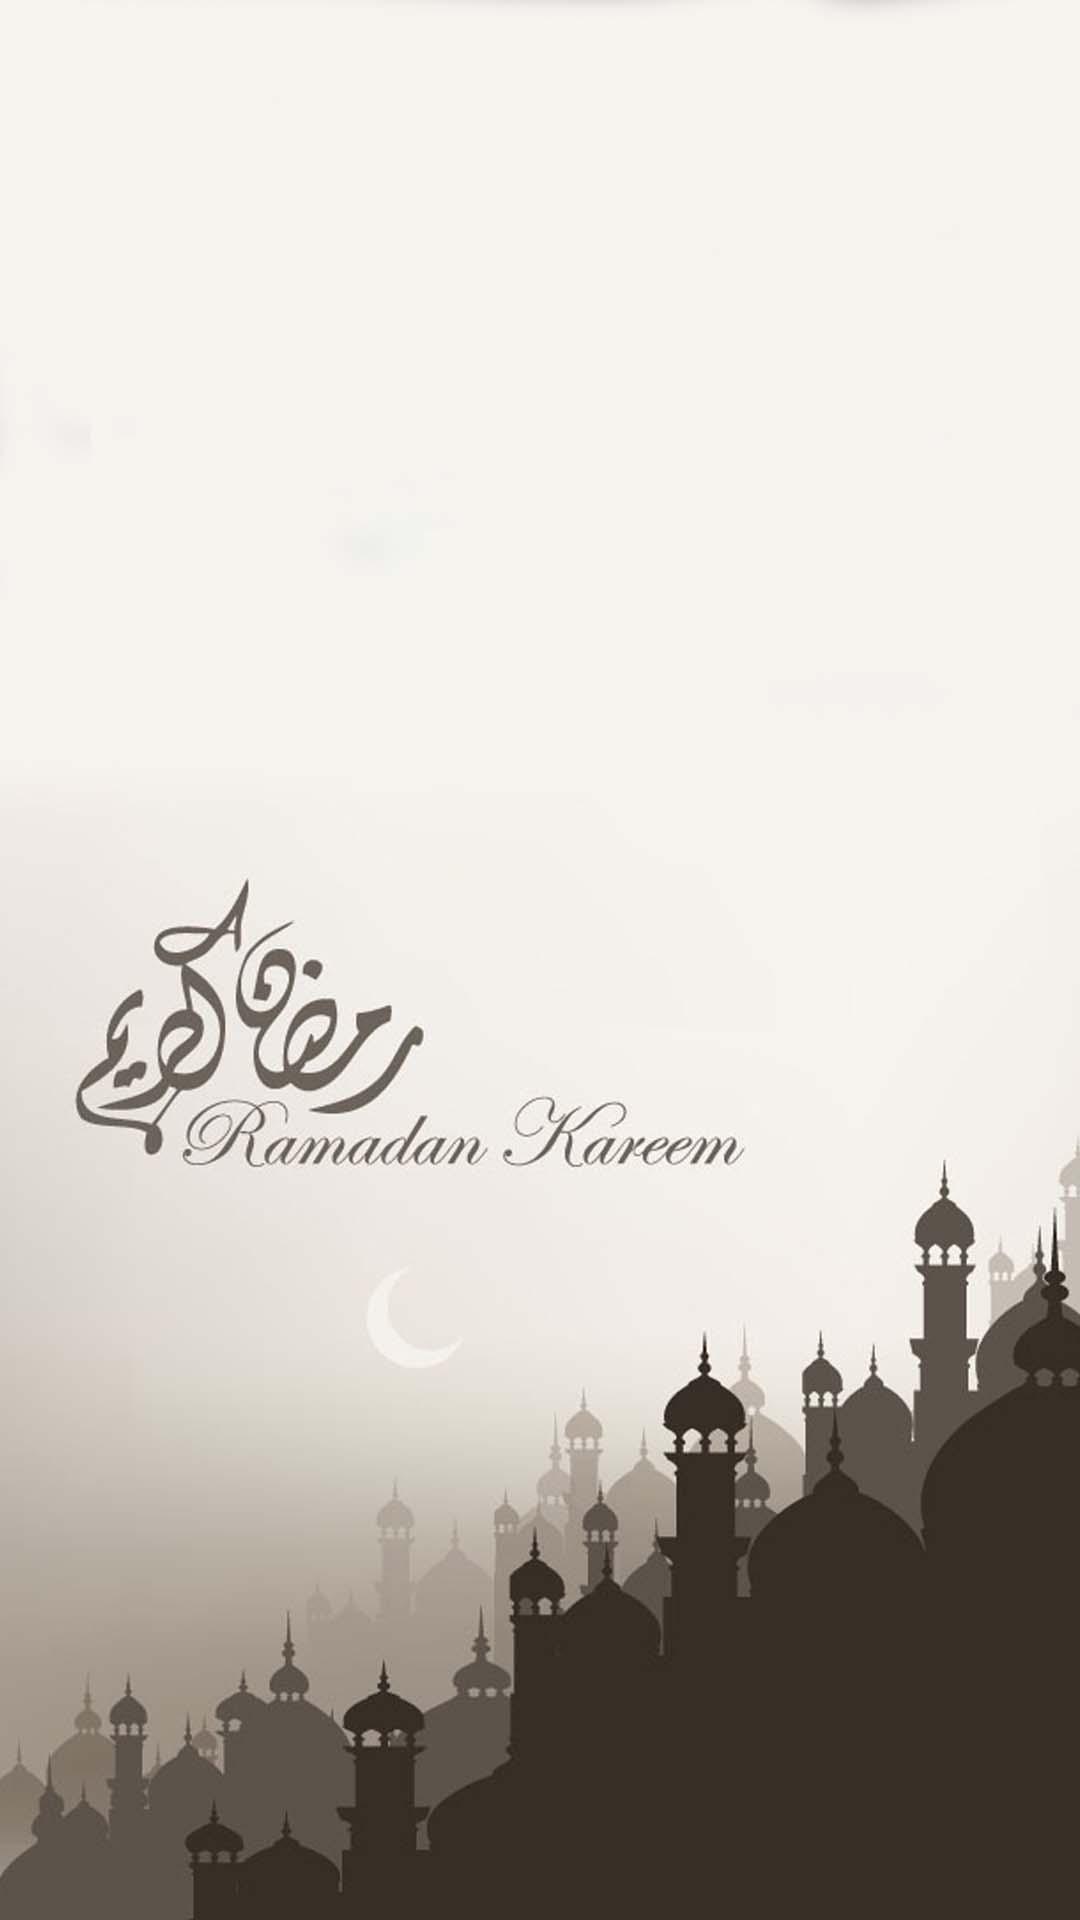 خلفيات موبايل رمضان كريم Mobile Wallpapers HD 5 خلفيات موبايل رمضان كريم Mobile Wallpapers HD